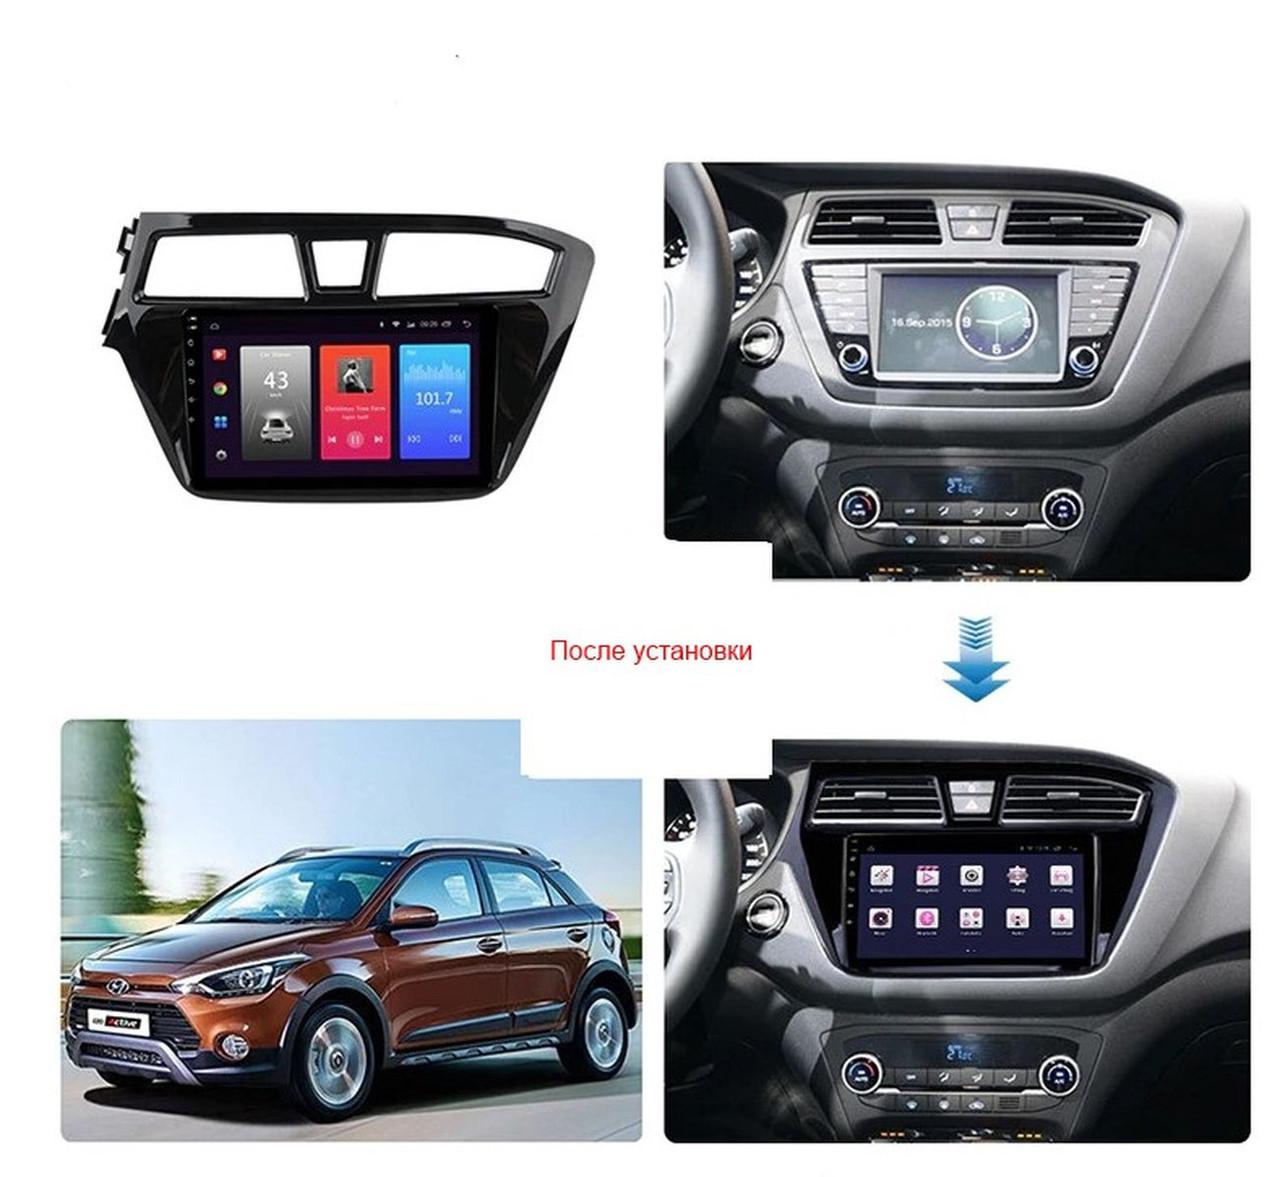 Штатная Android Магнитола на Hyundai i20 2014-2018 Model 3G-WiFi-solution (М-Хи20н-9-3Ж)